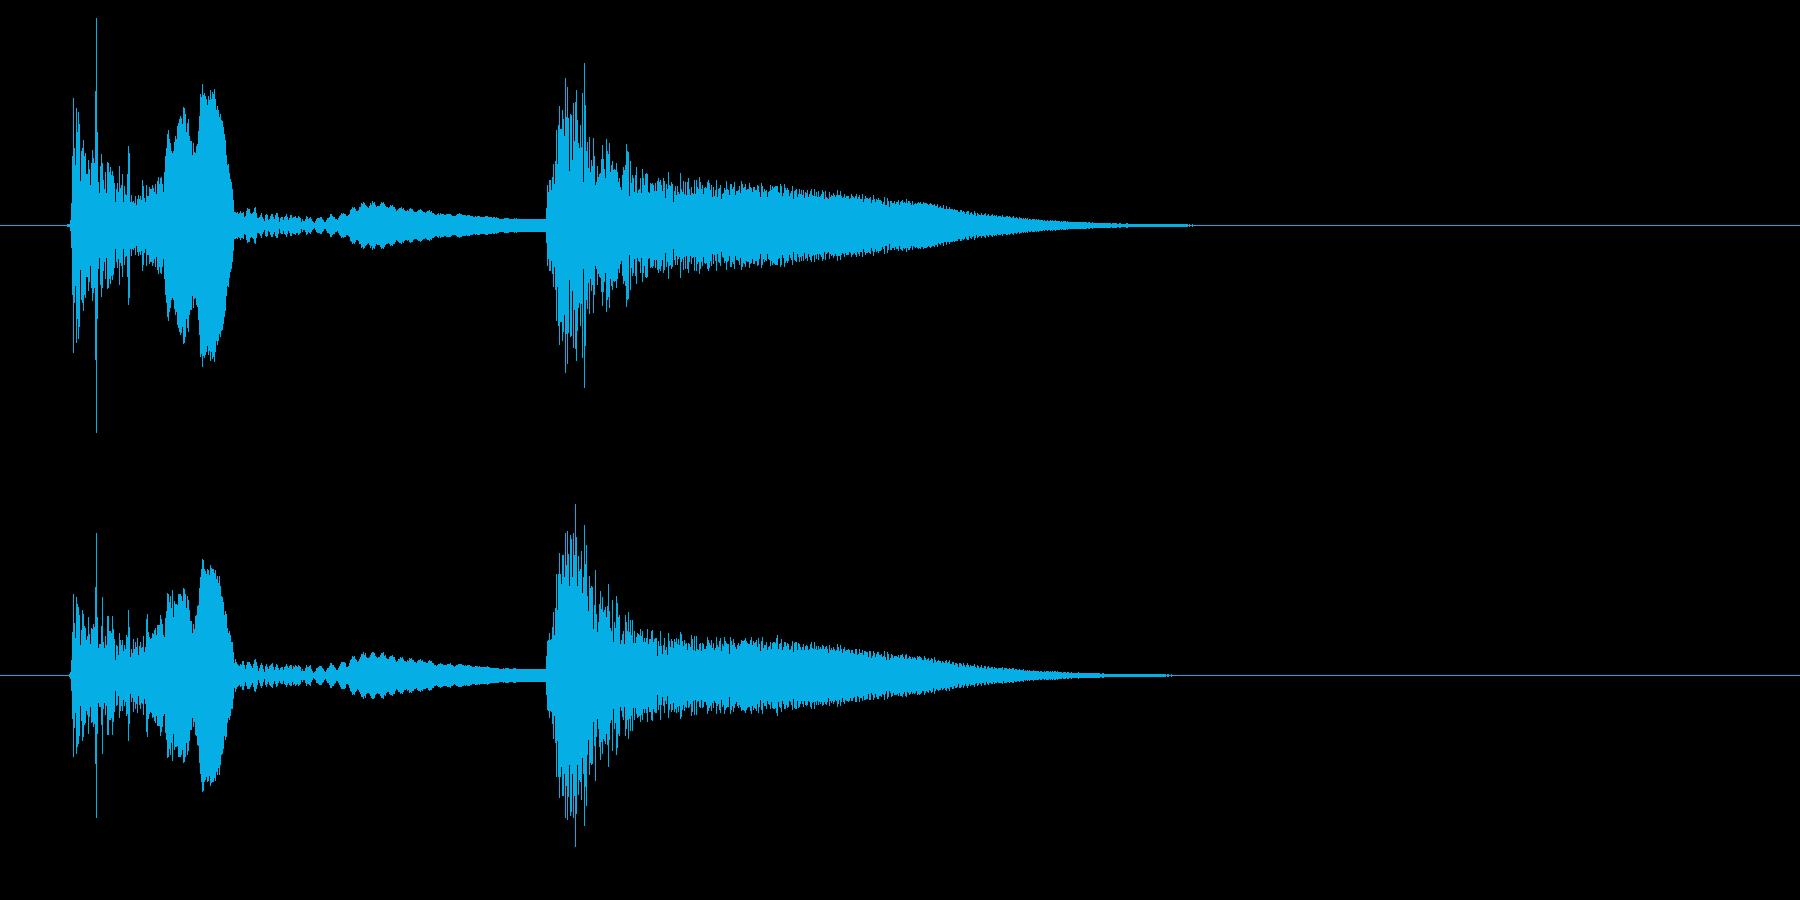 【SE 効果音】ネジが飛ぶ音の再生済みの波形